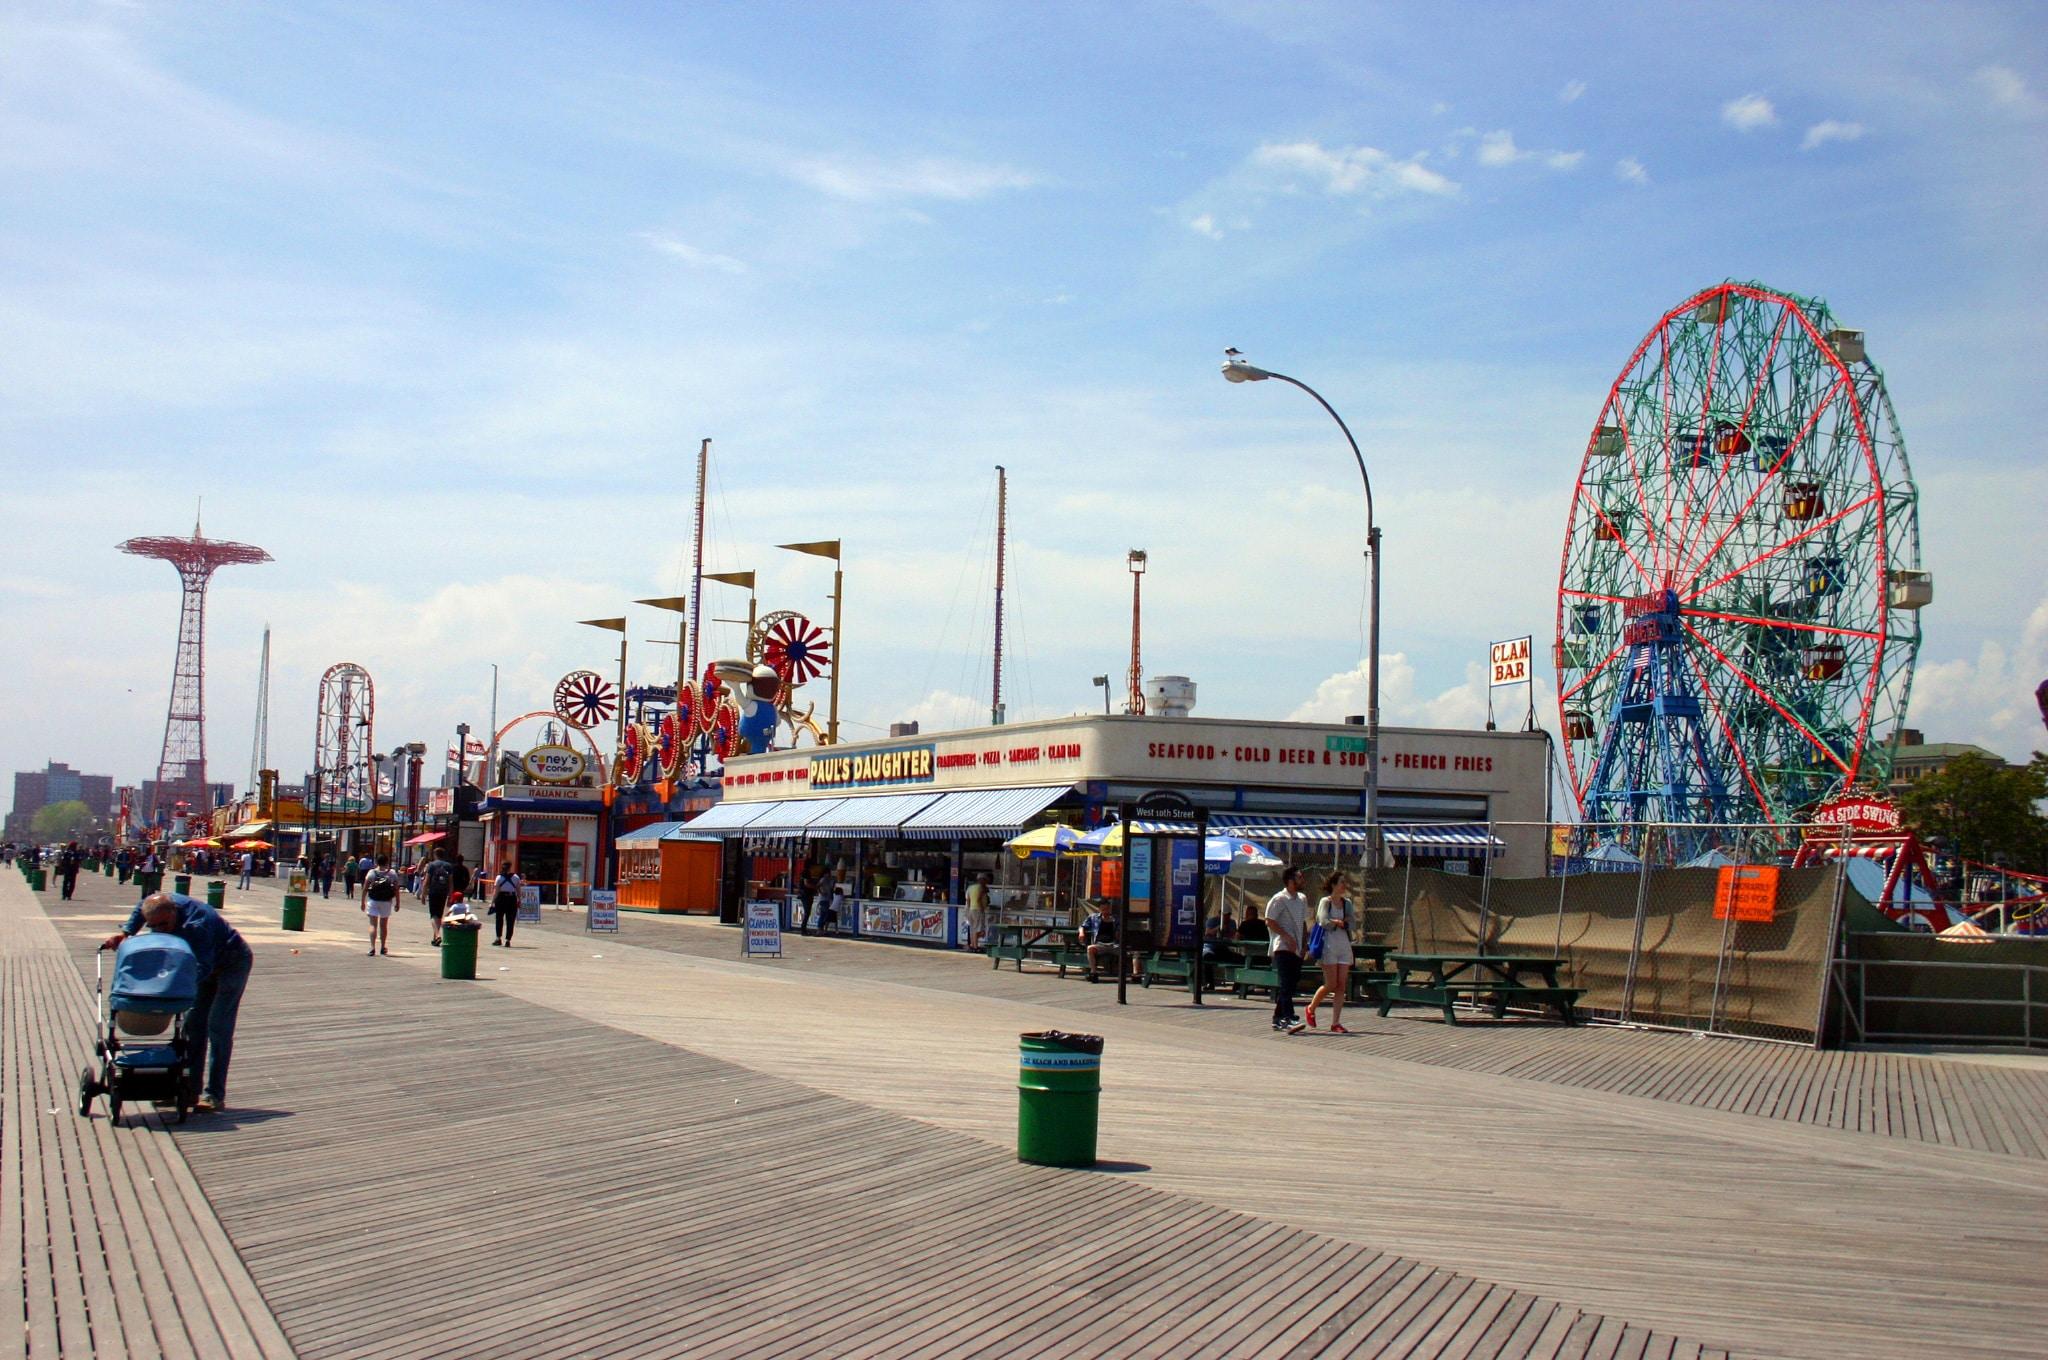 luna park attractions coney island new york blog voyage new york. Black Bedroom Furniture Sets. Home Design Ideas